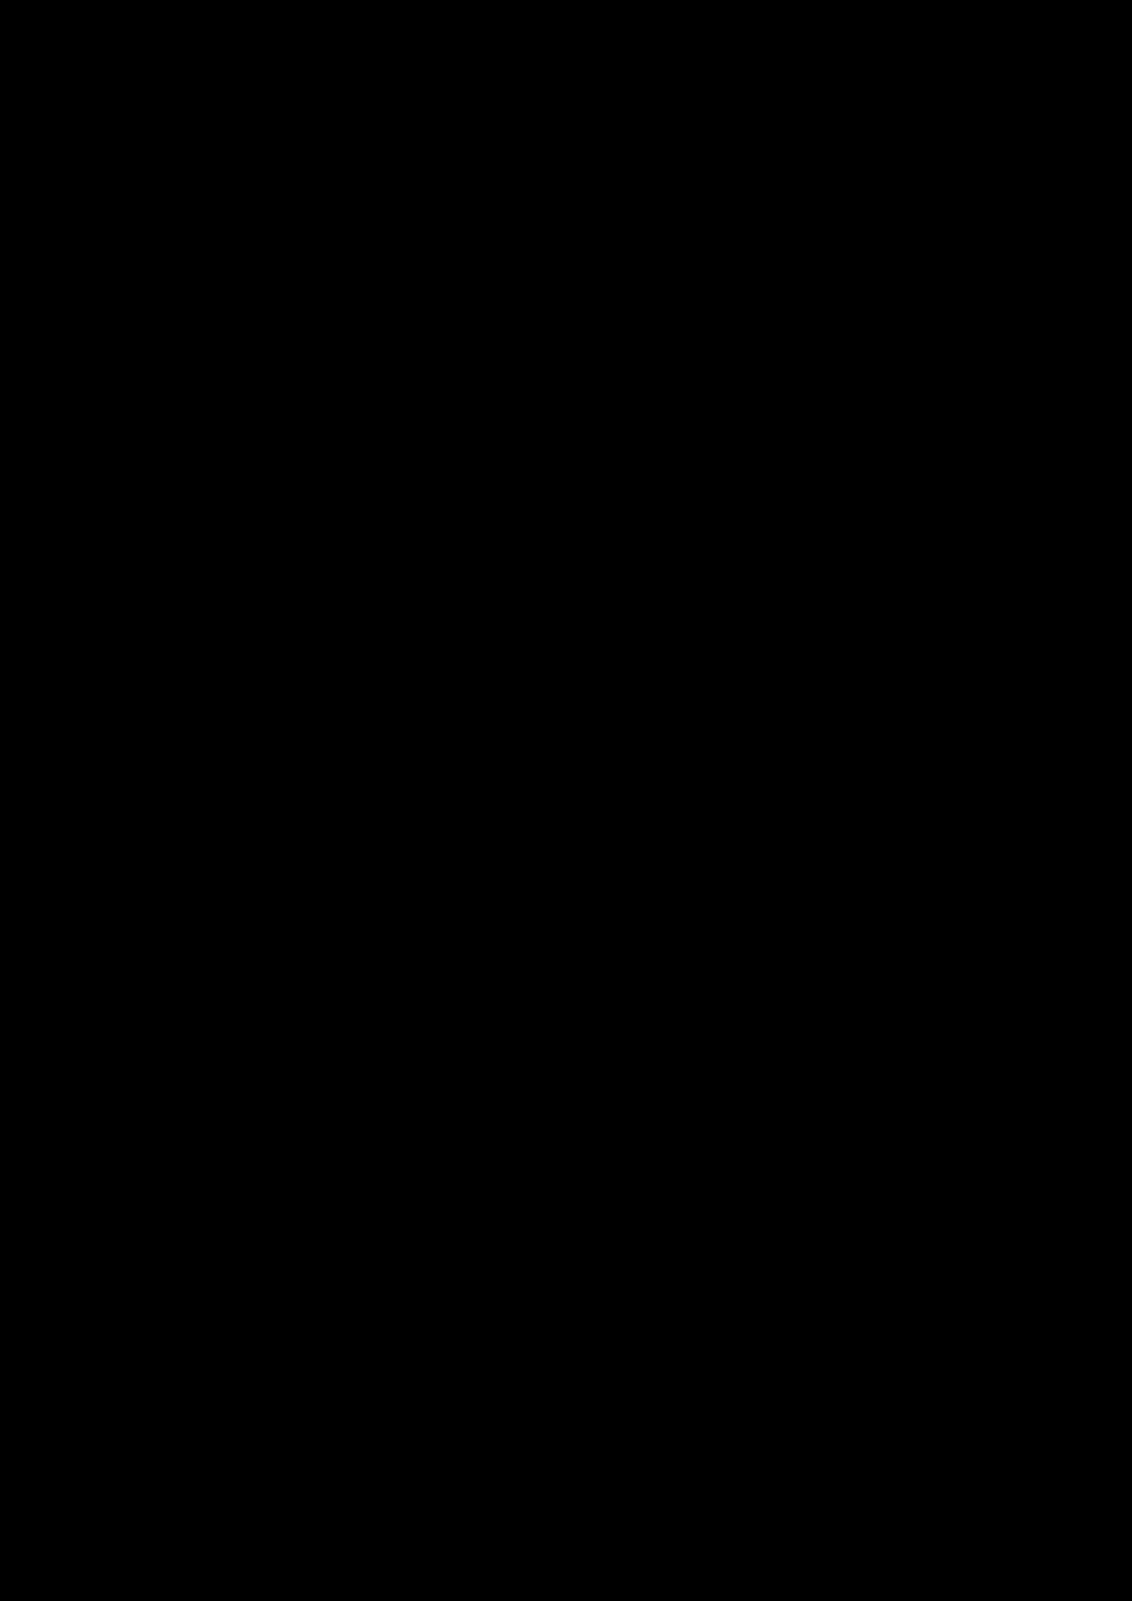 Belyiy sokol slide, Image 30